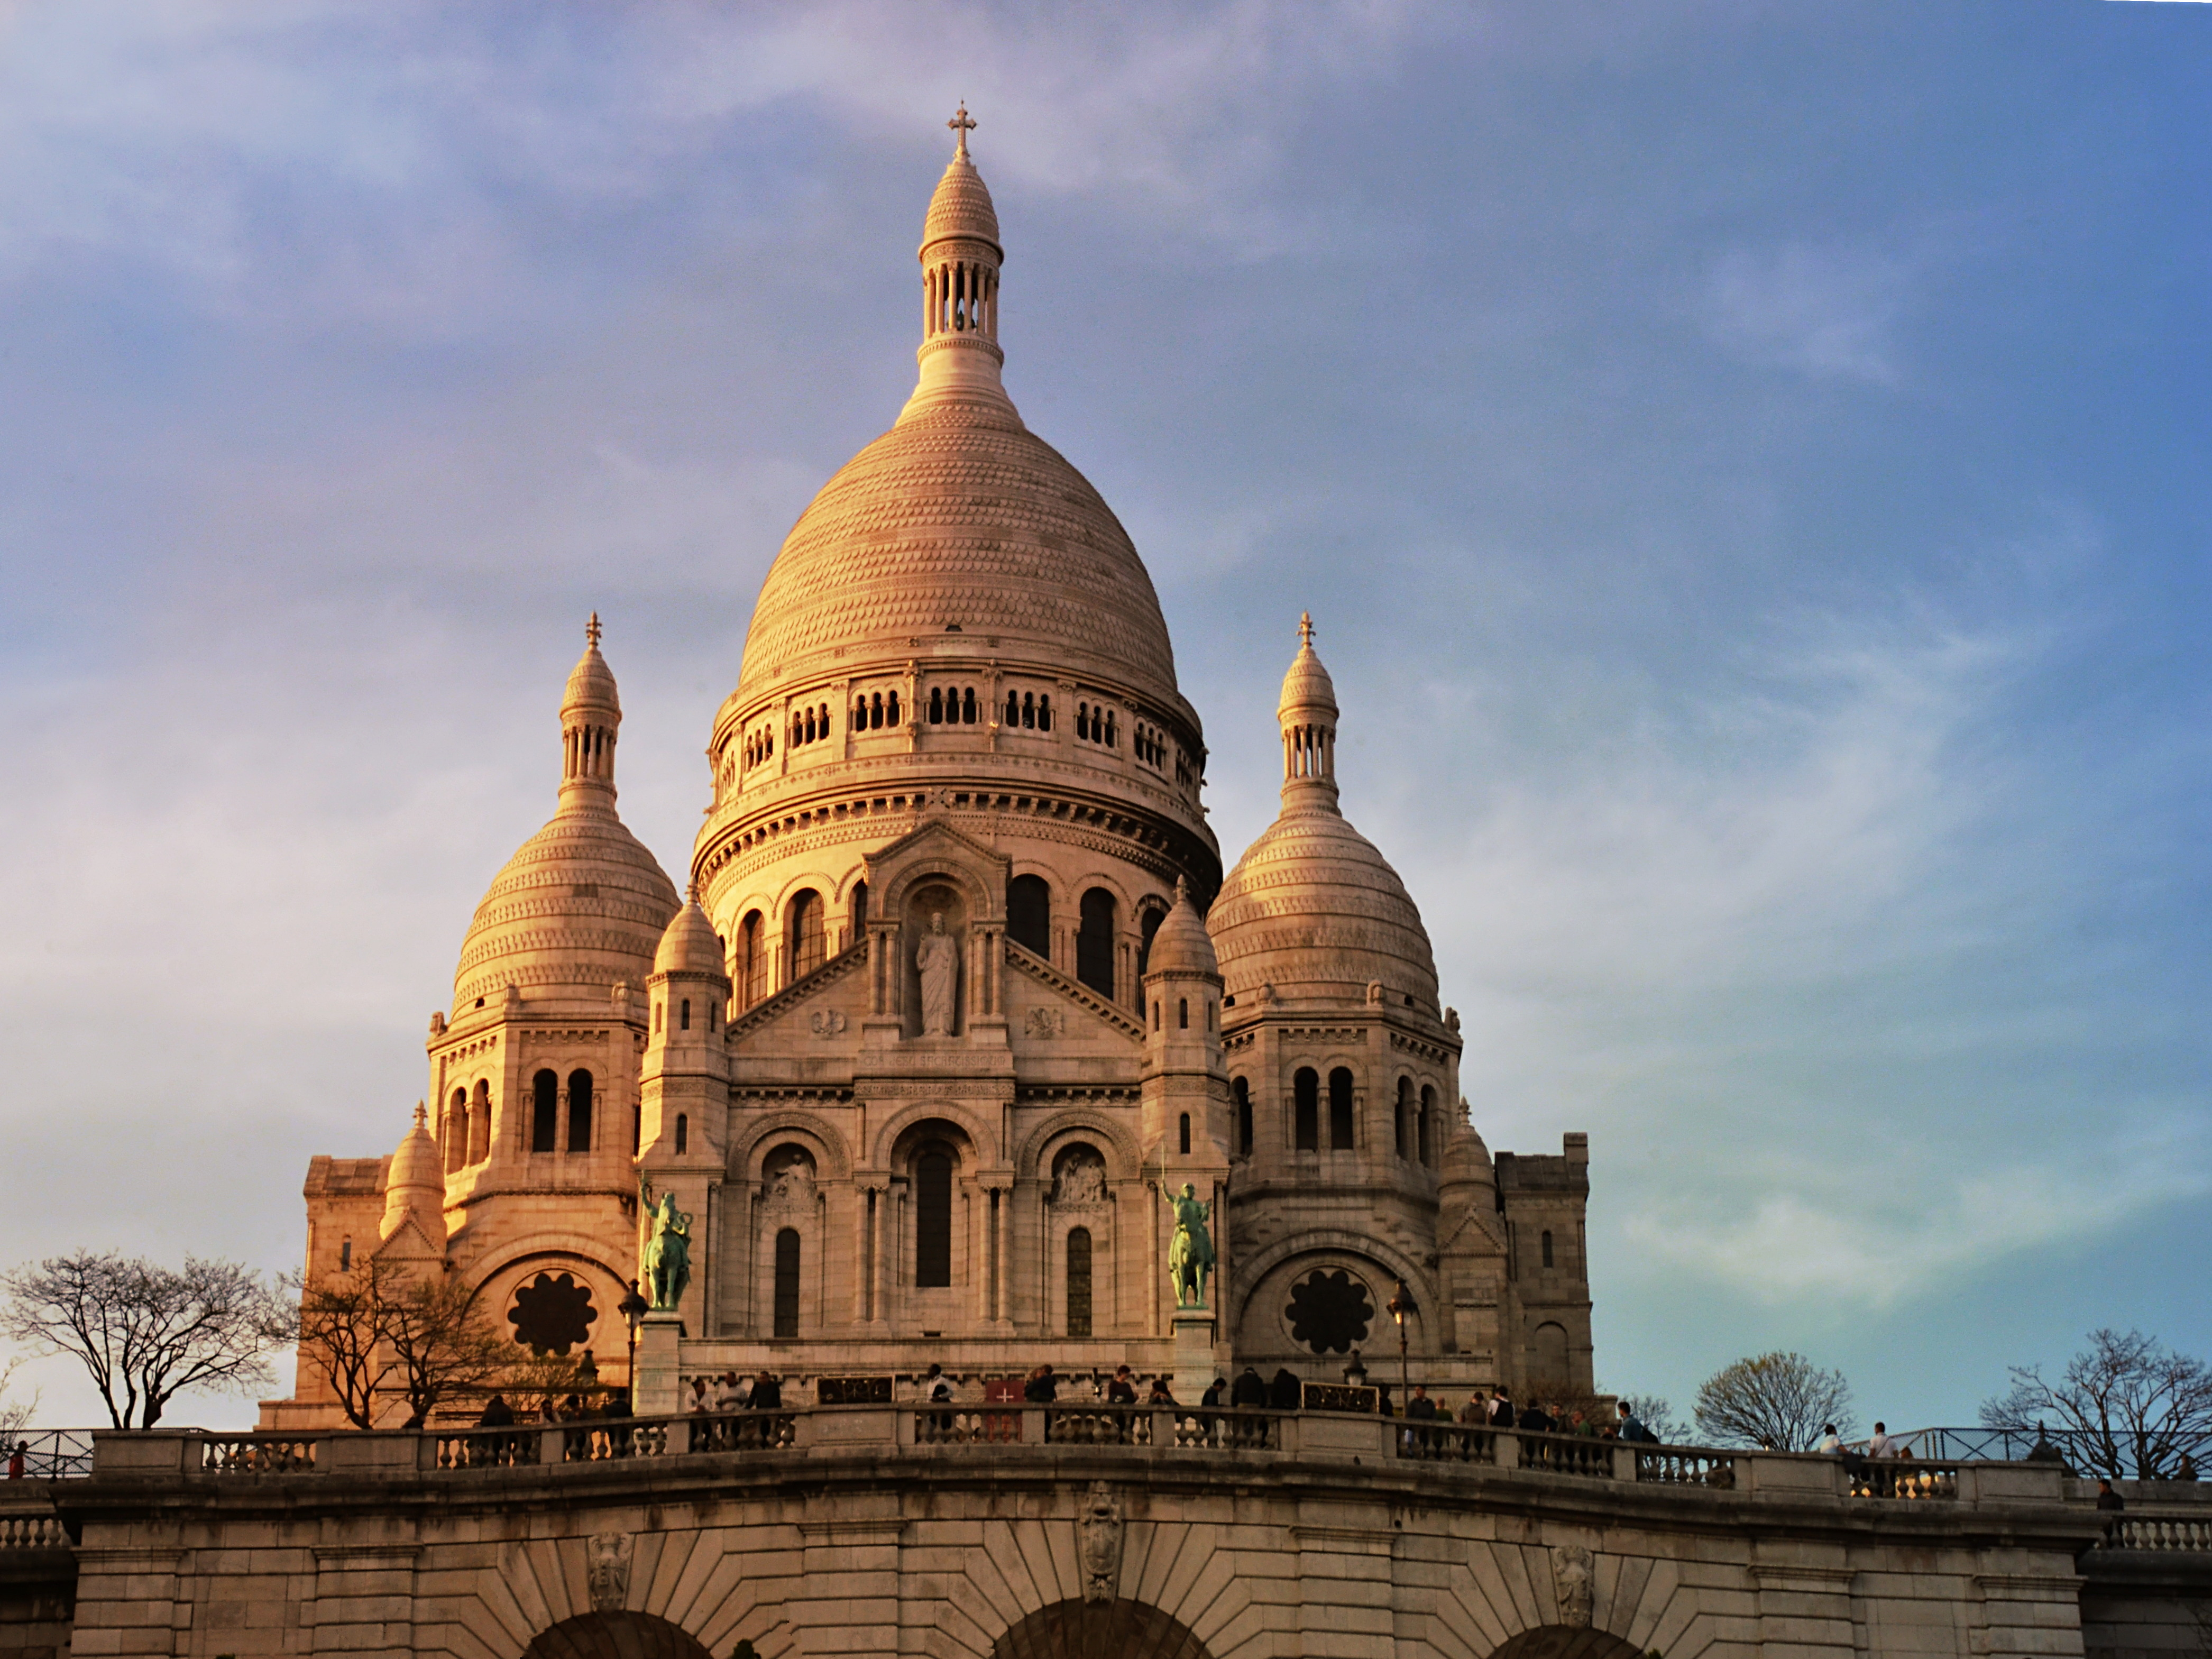 Онлайн-экскурсия «Романтика Парижа. Богемный Монмартр»